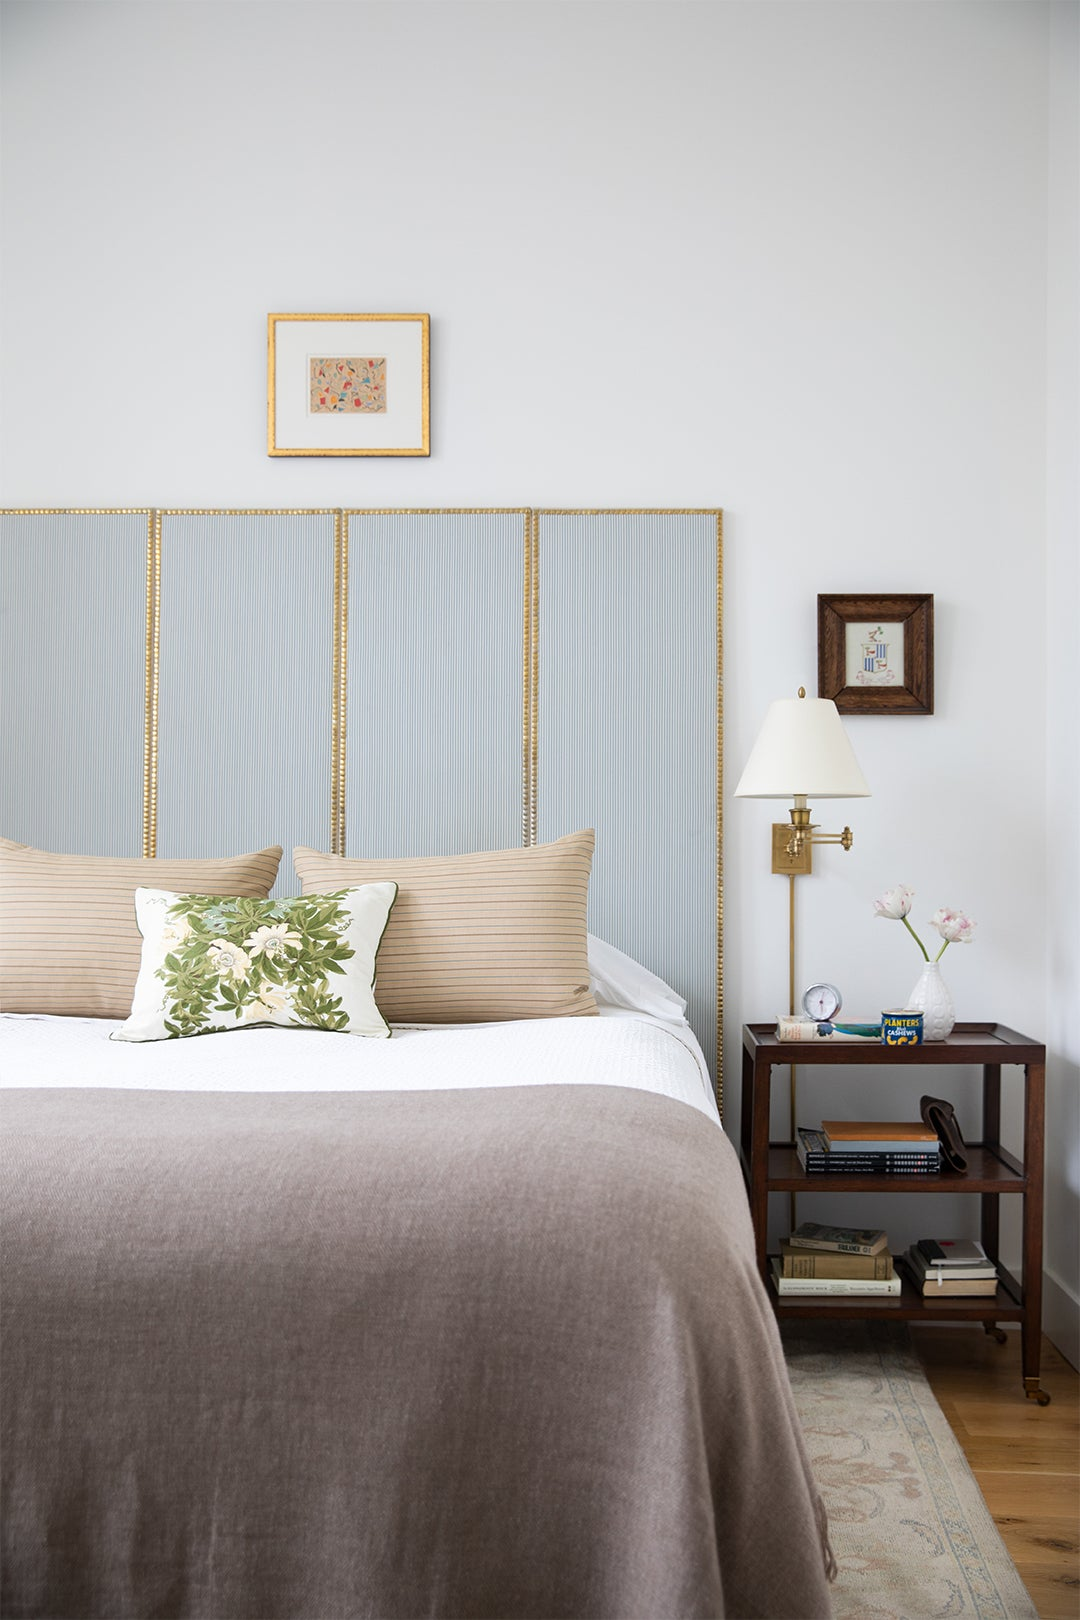 Bed with DIY Screen Headboard